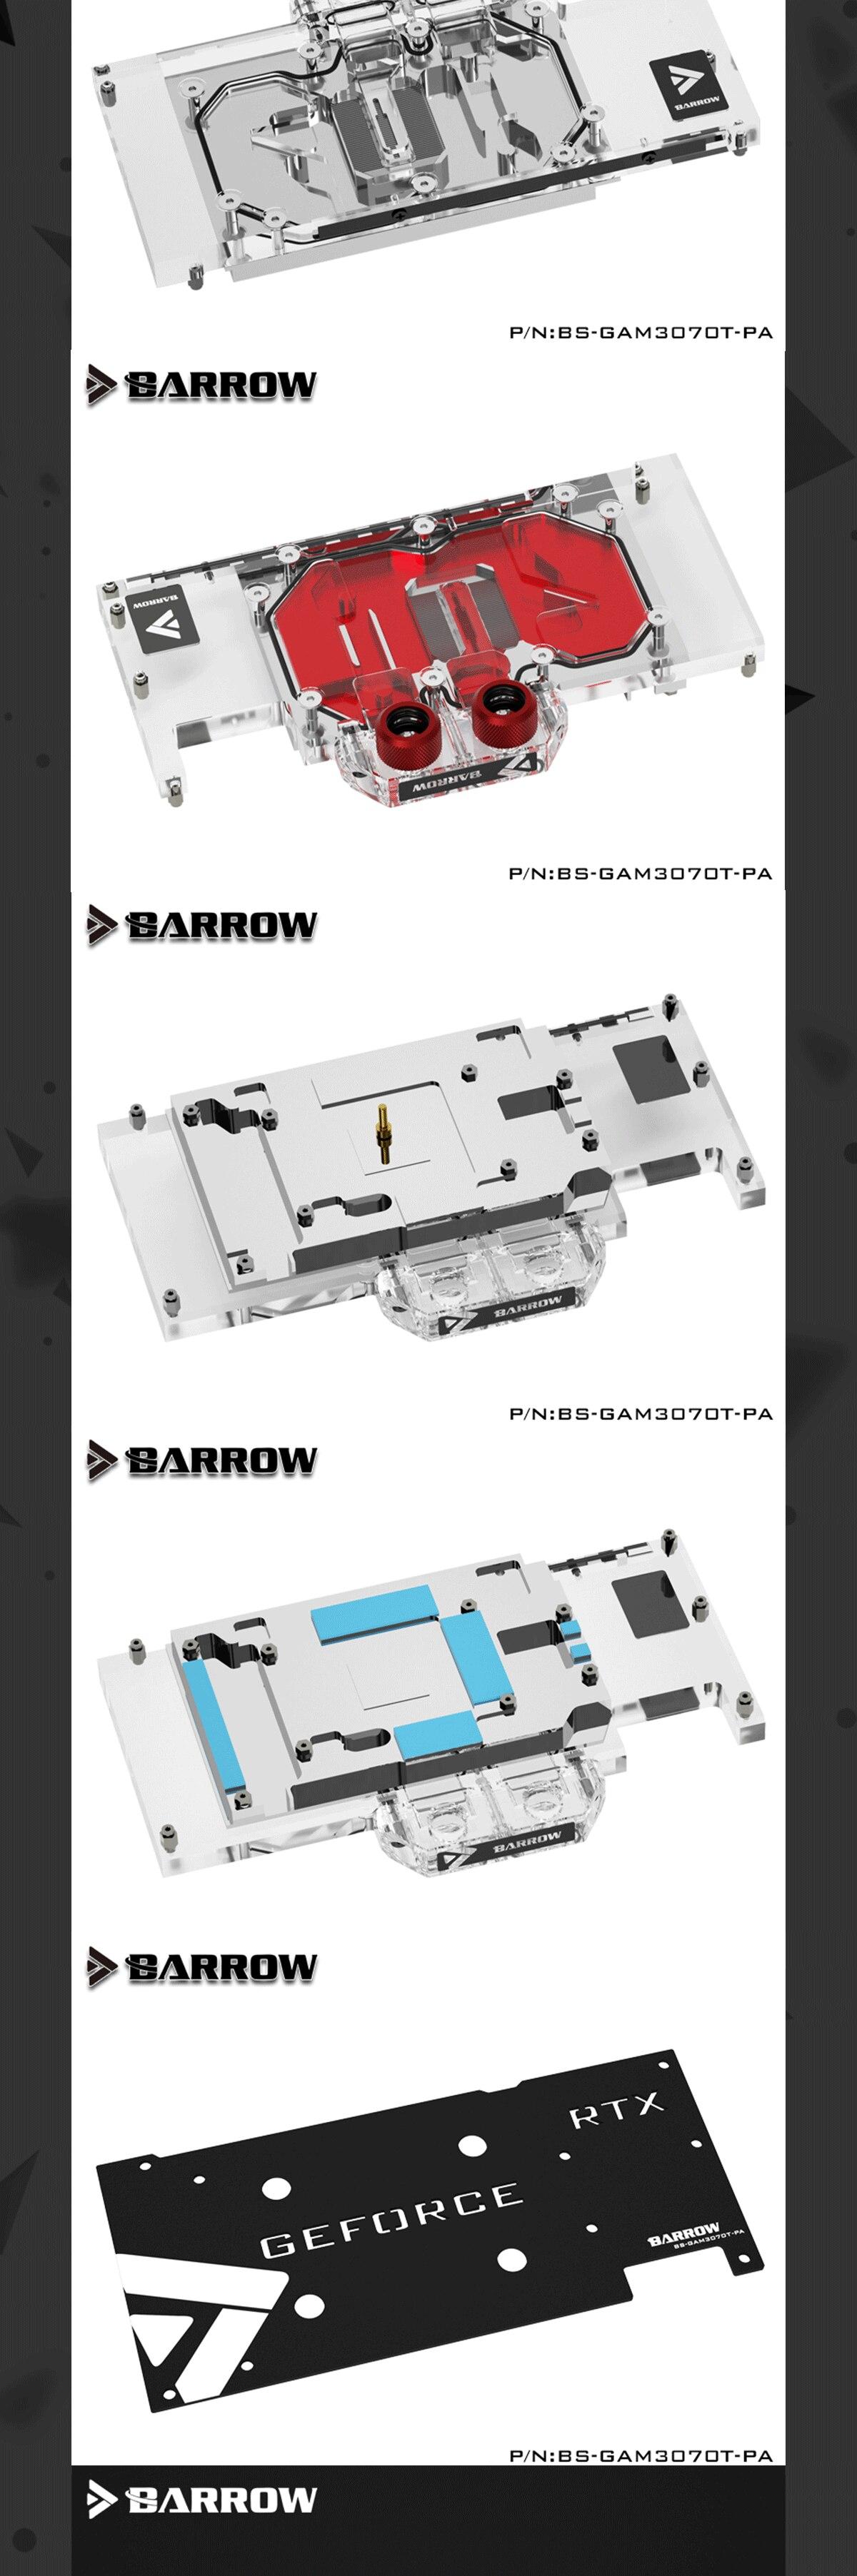 Barrow GPU Water Block for Galax / Gainward RTX 3070TI OC GPU Card Full Cover Water Cooler , With Backplane BS-GAM3070T-PA